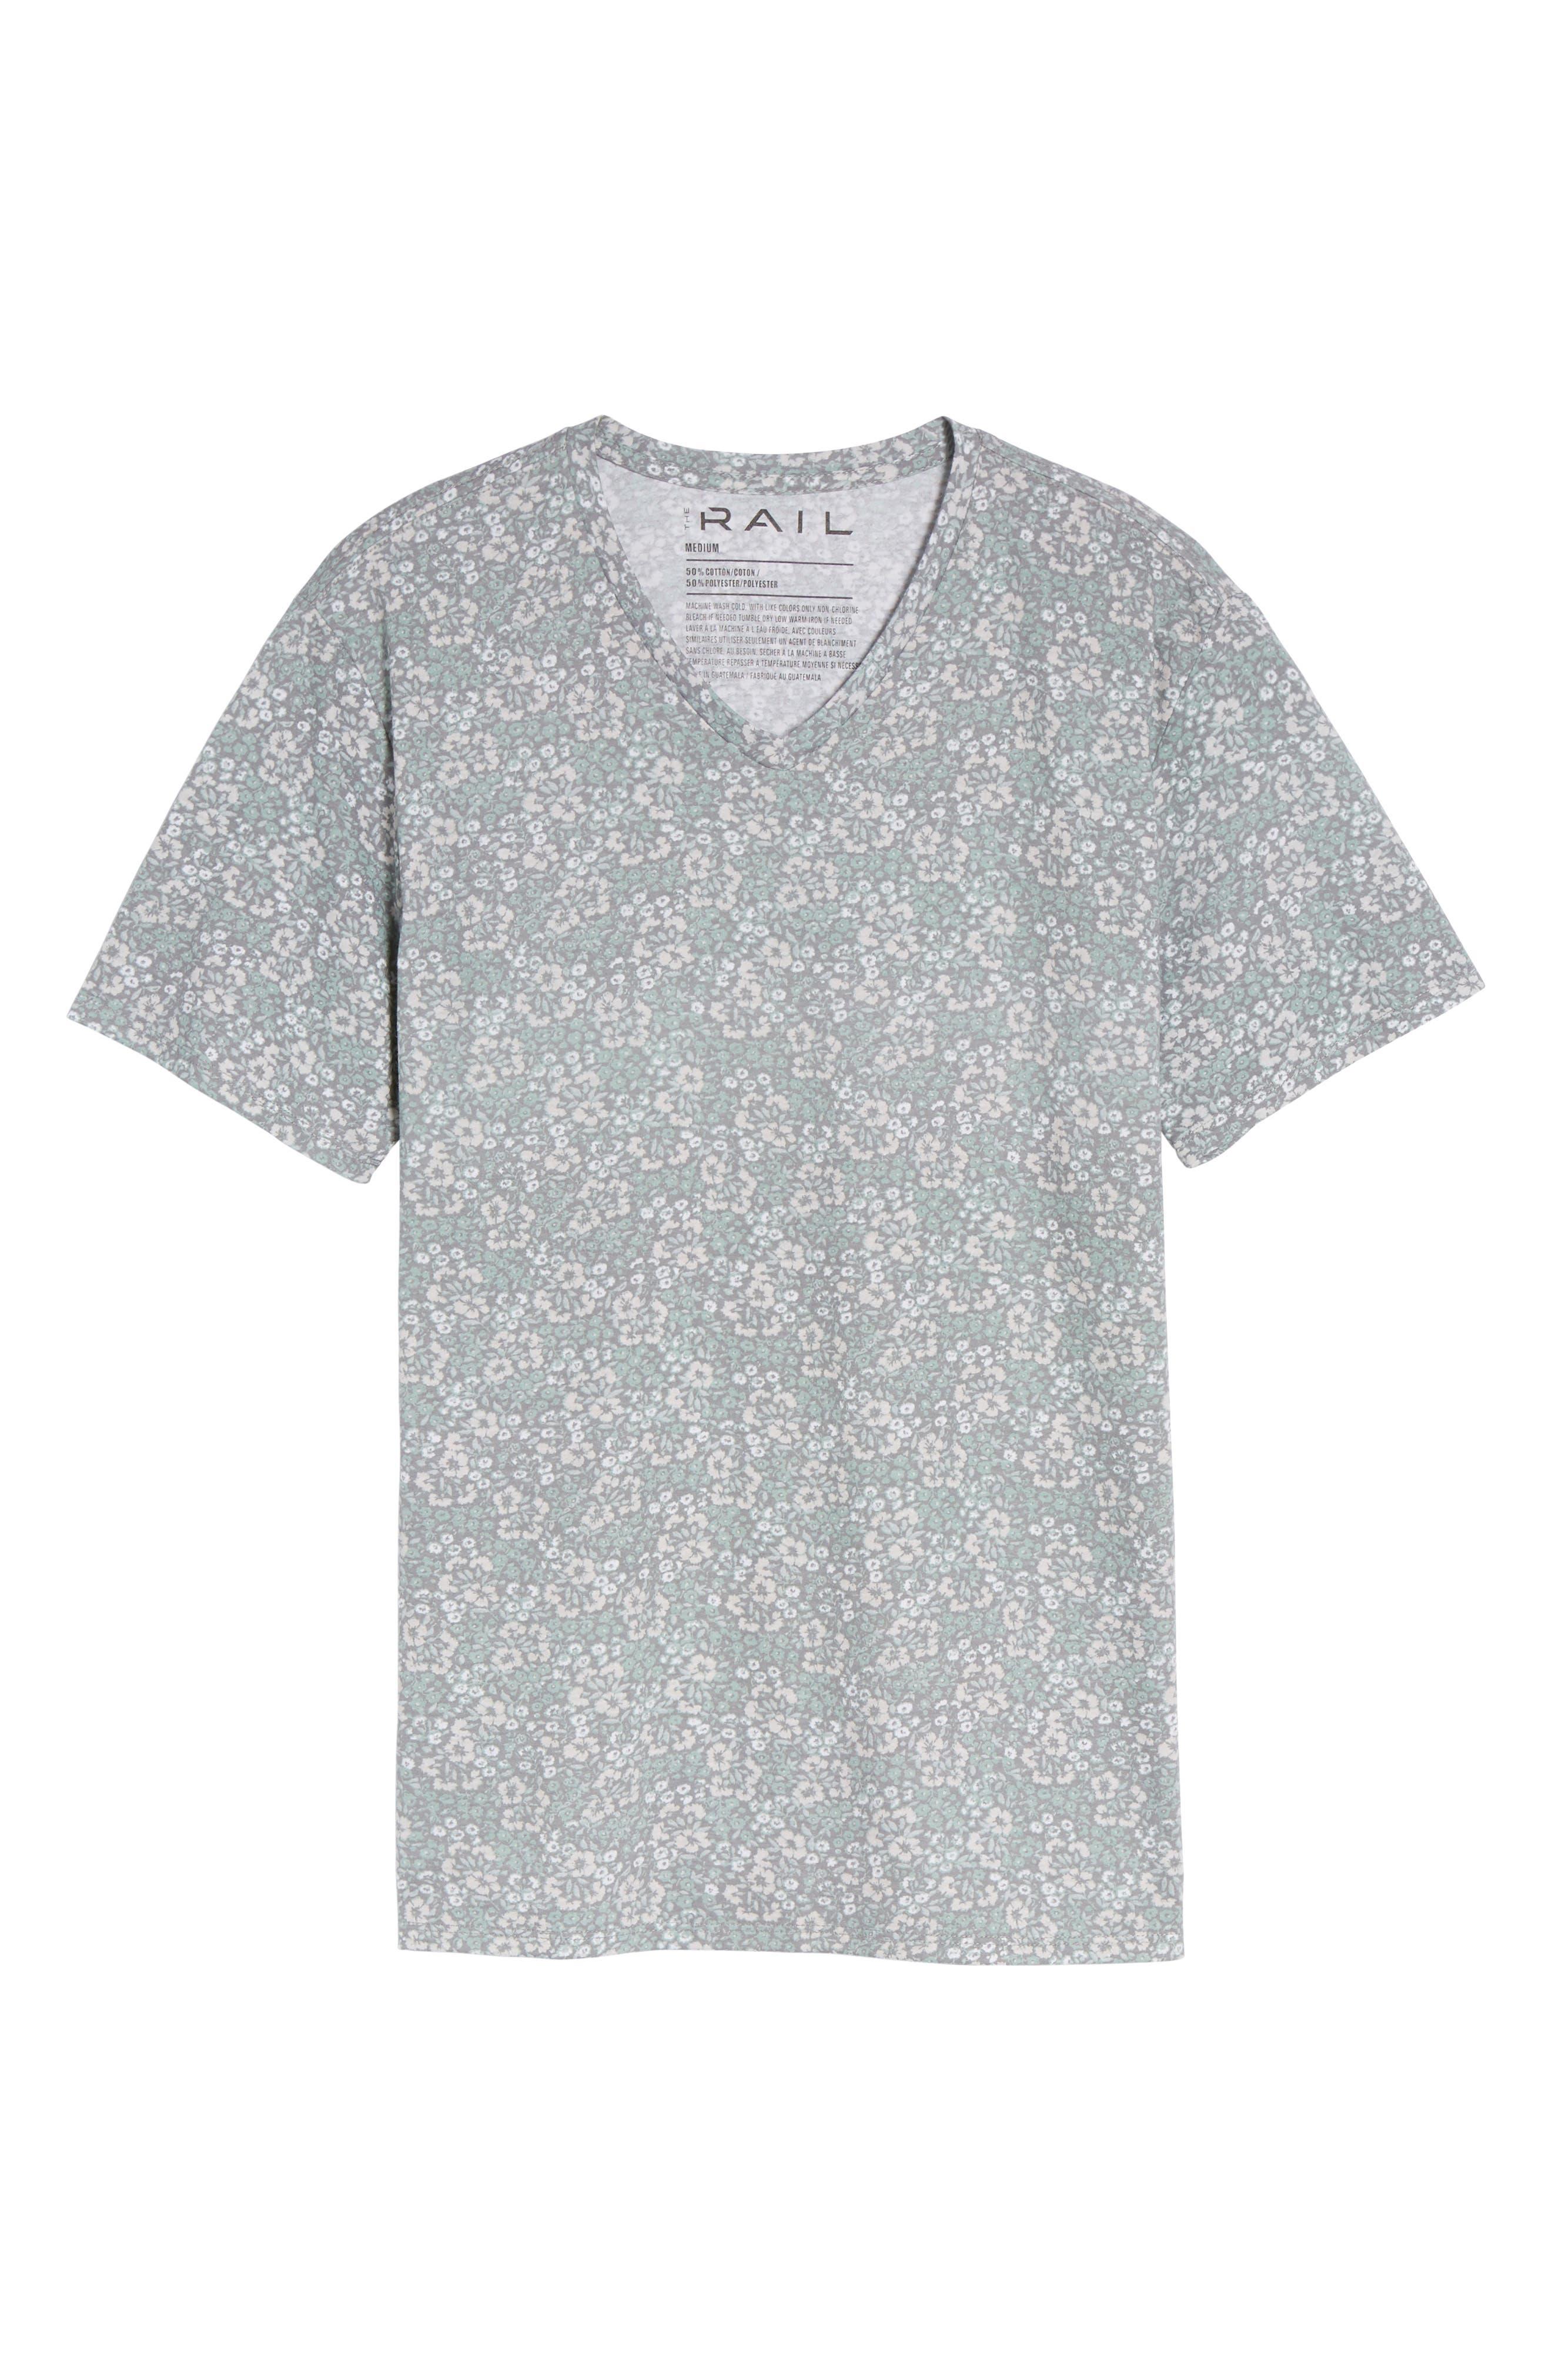 Main Image - The Rail V-Neck T-Shirt (2 for $30)